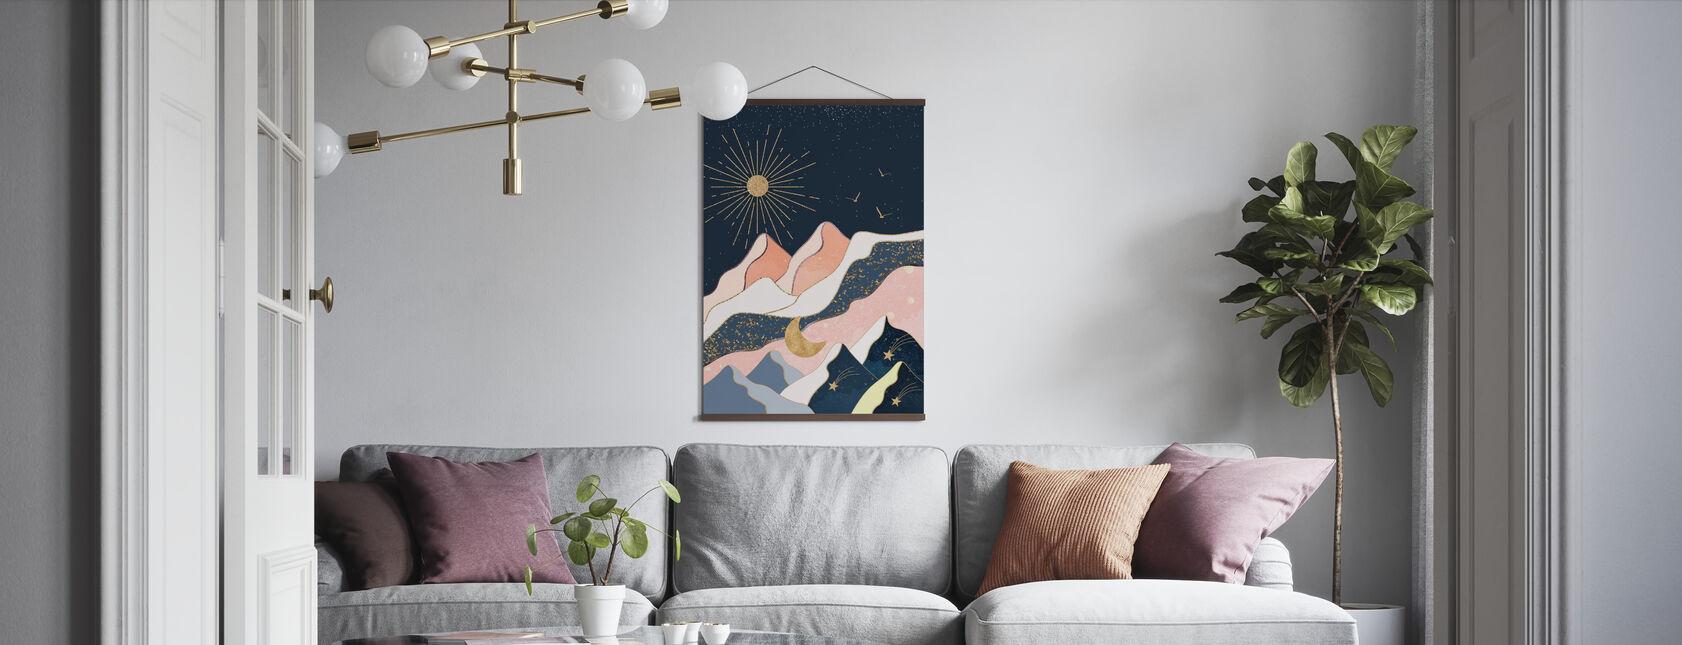 Sun Moon sterren en bergen - Poster - Woonkamer